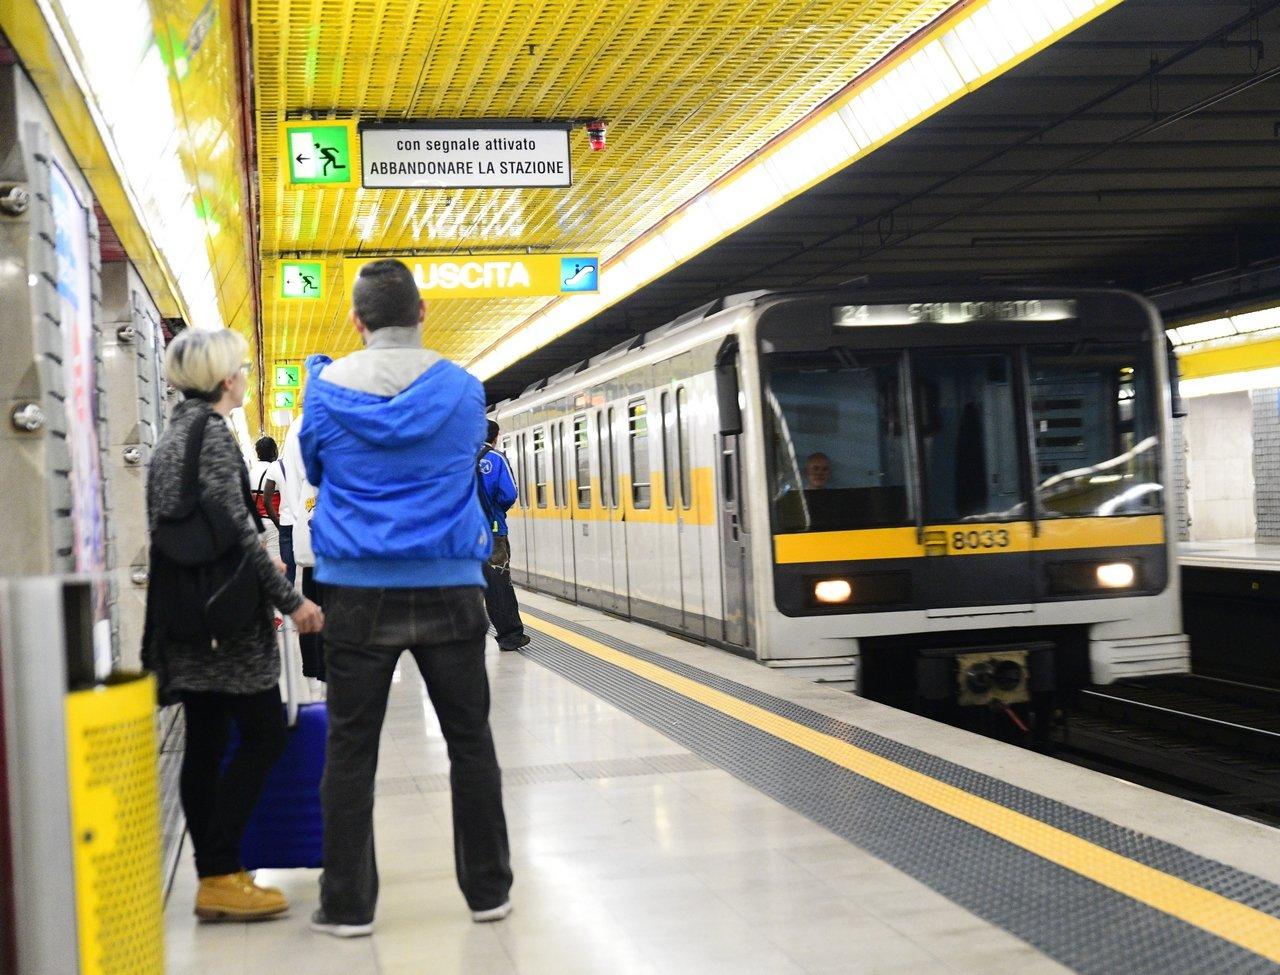 Metro punainen linja nopeus dating